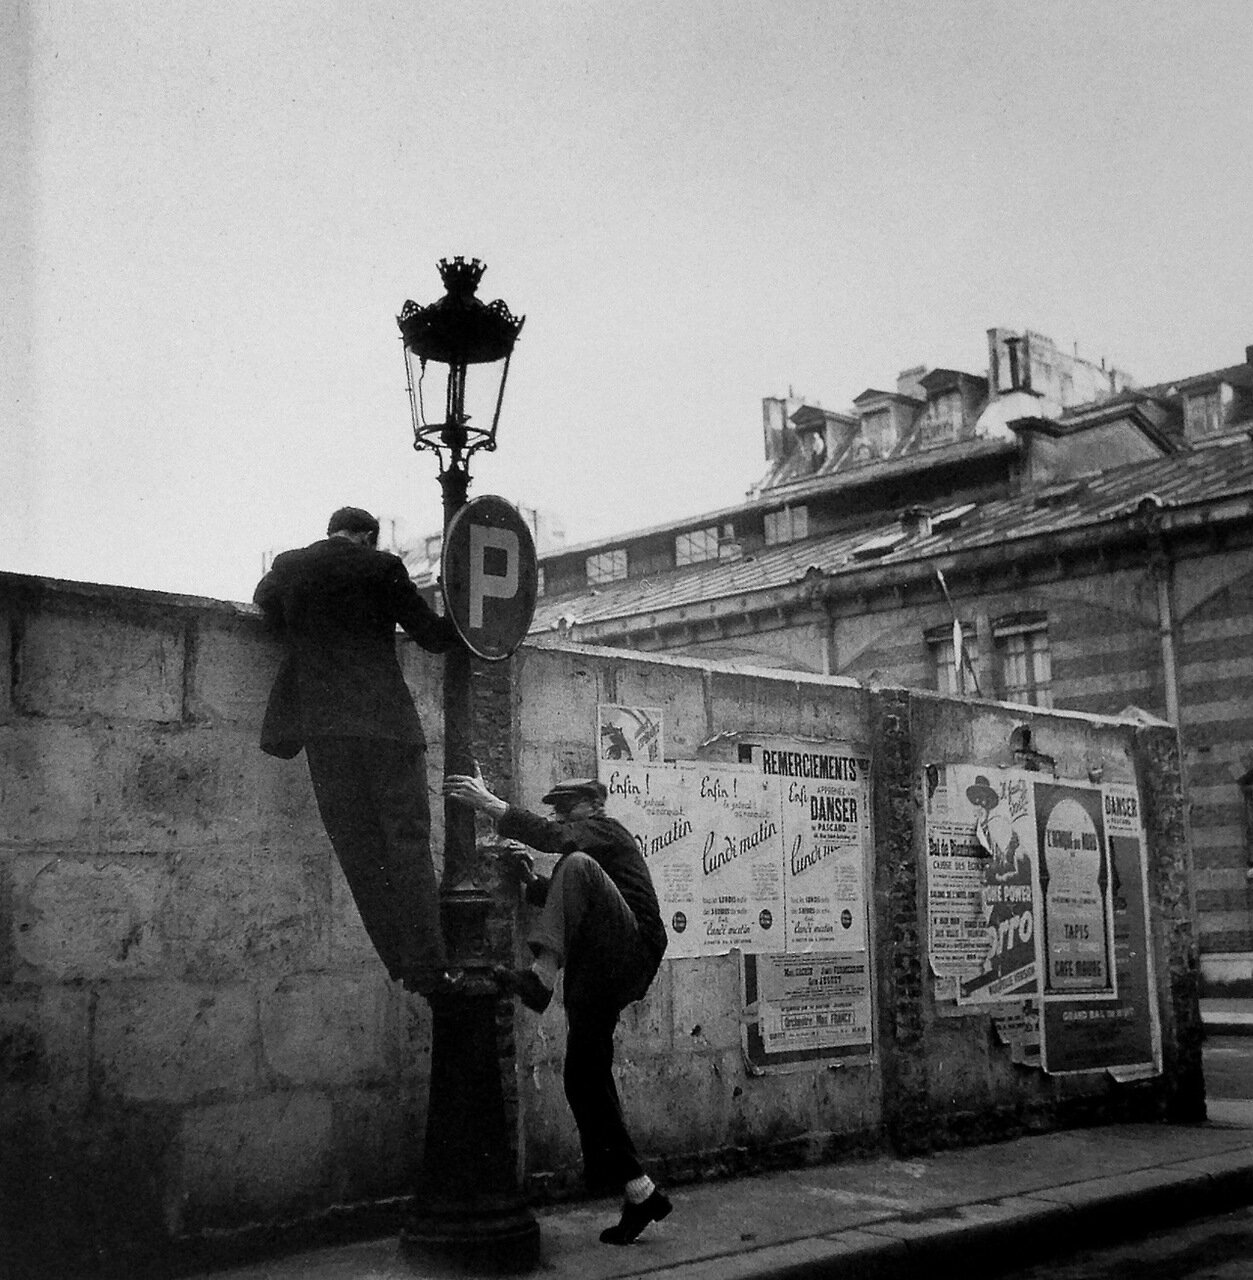 1945. Площадь дю Марше́-сант-Онорэ